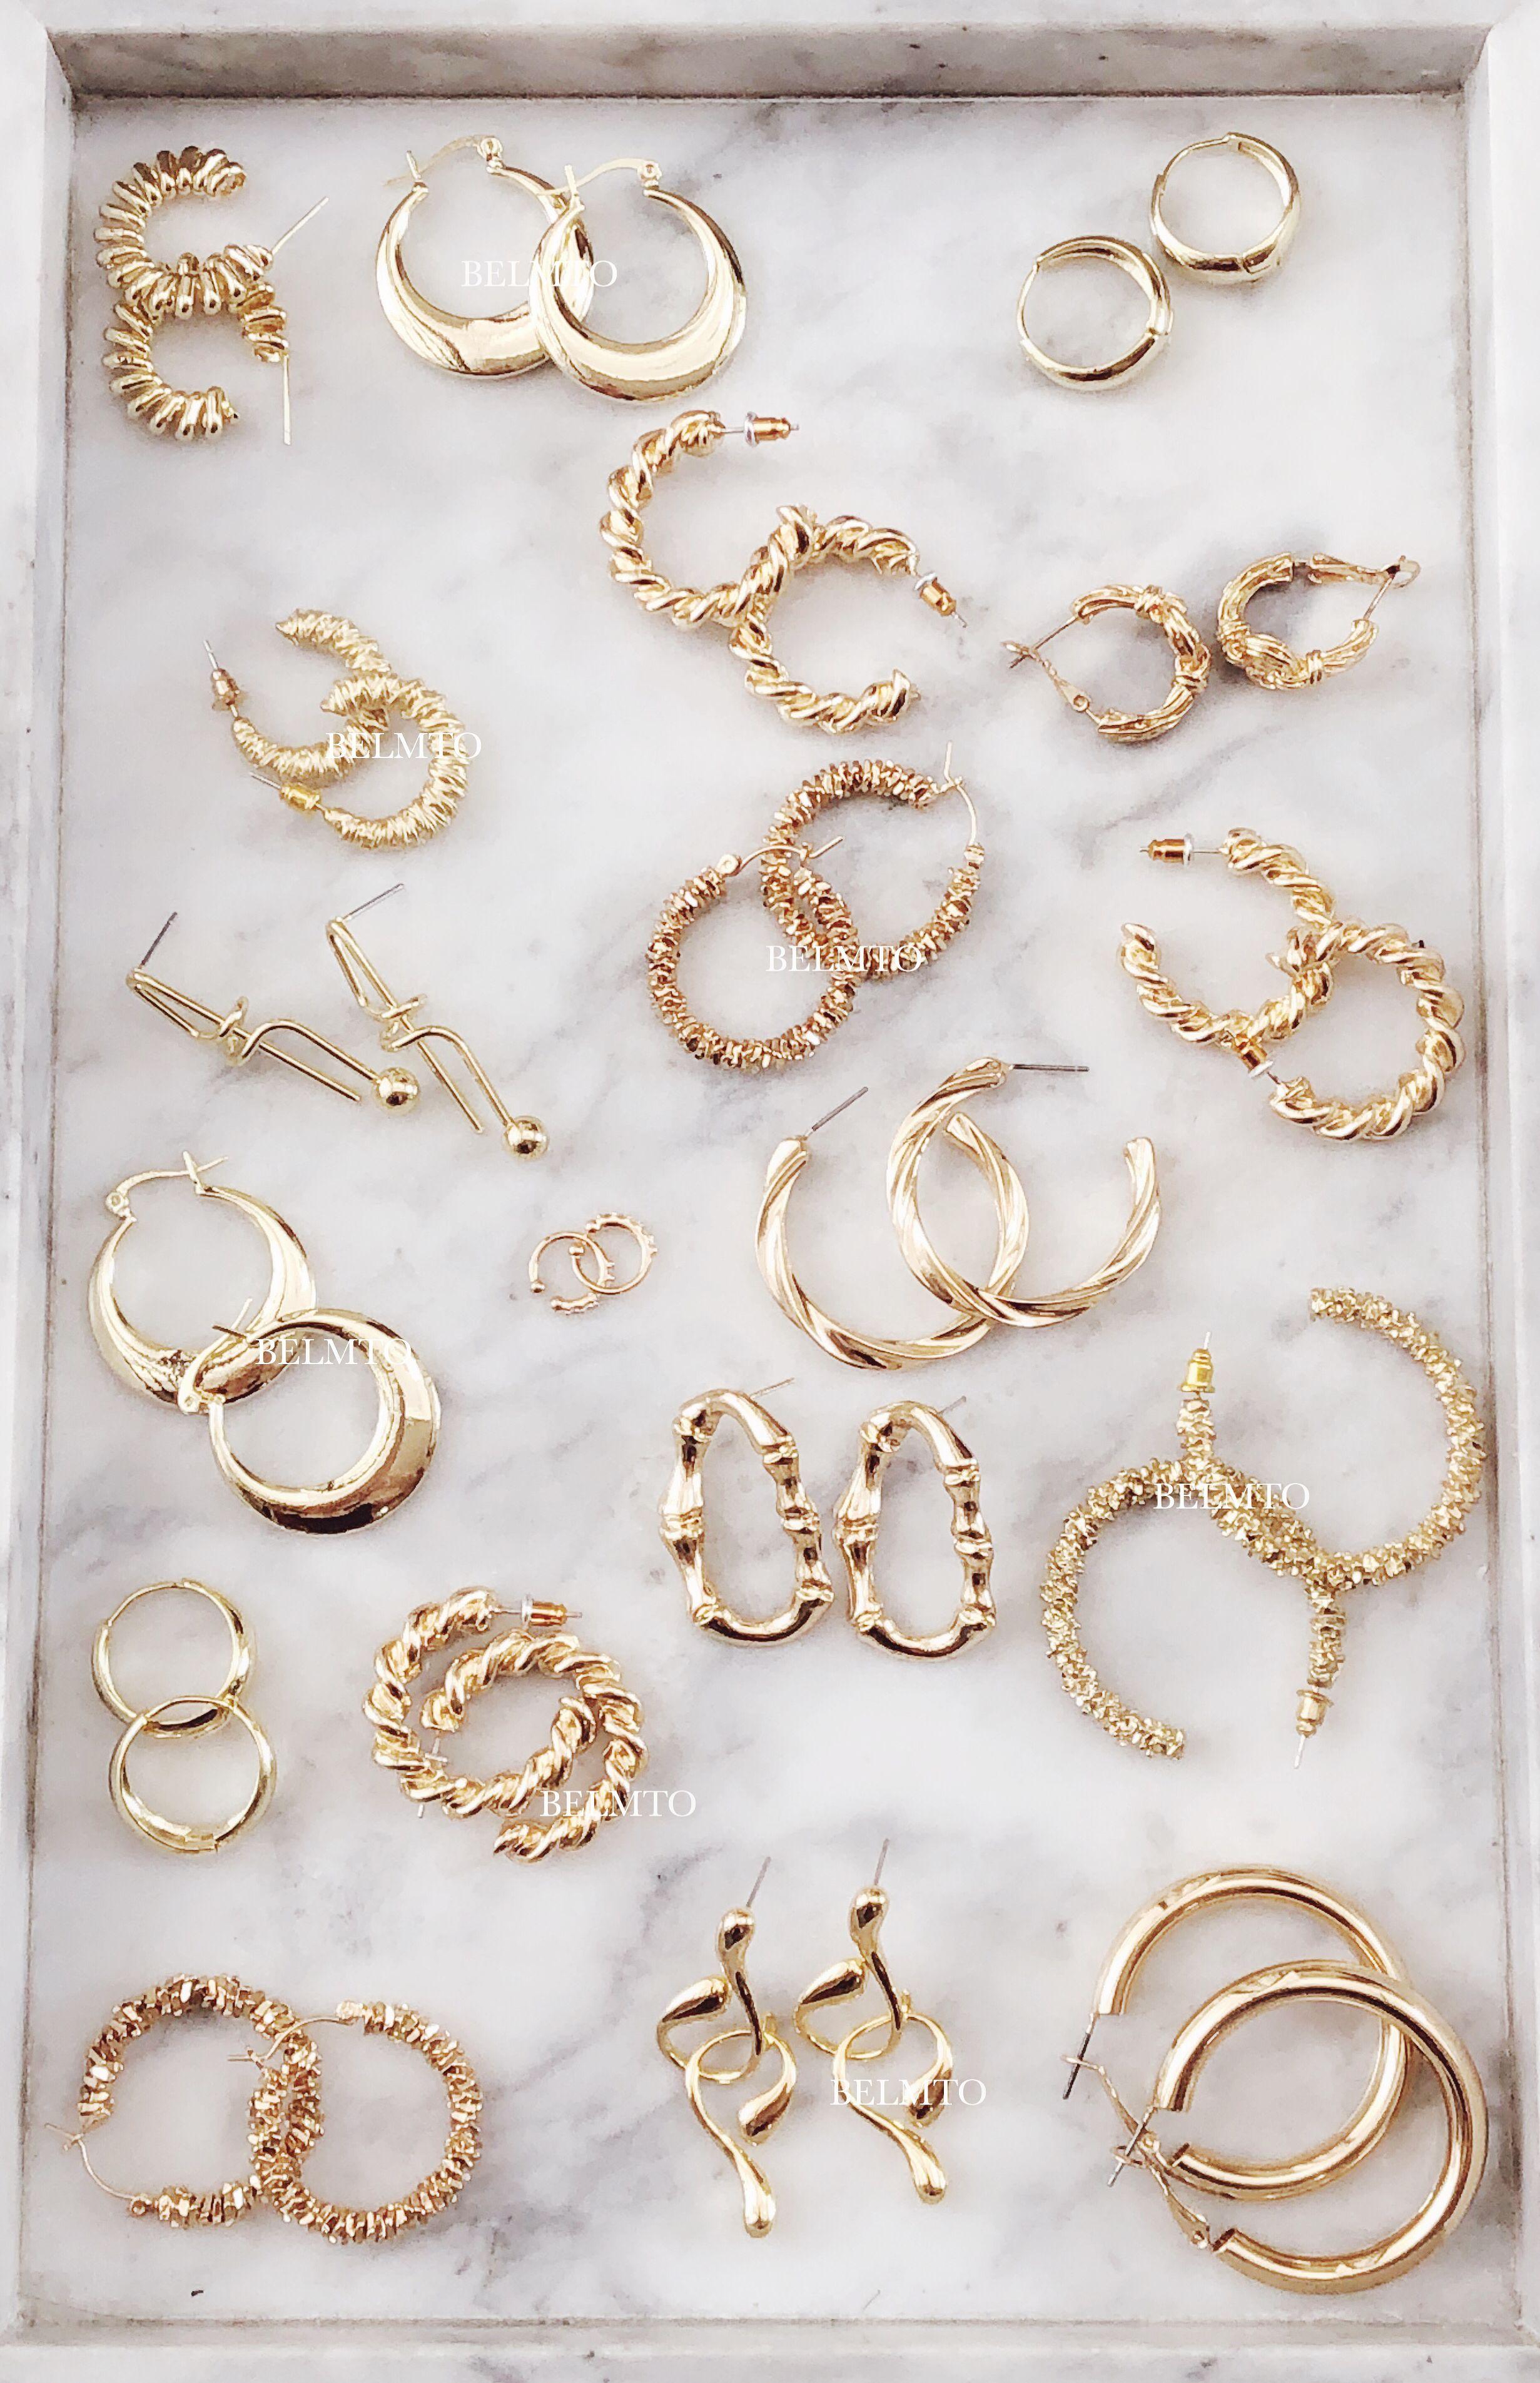 #belmto #style #minimalist #fashion #accessories #jewelry #simple